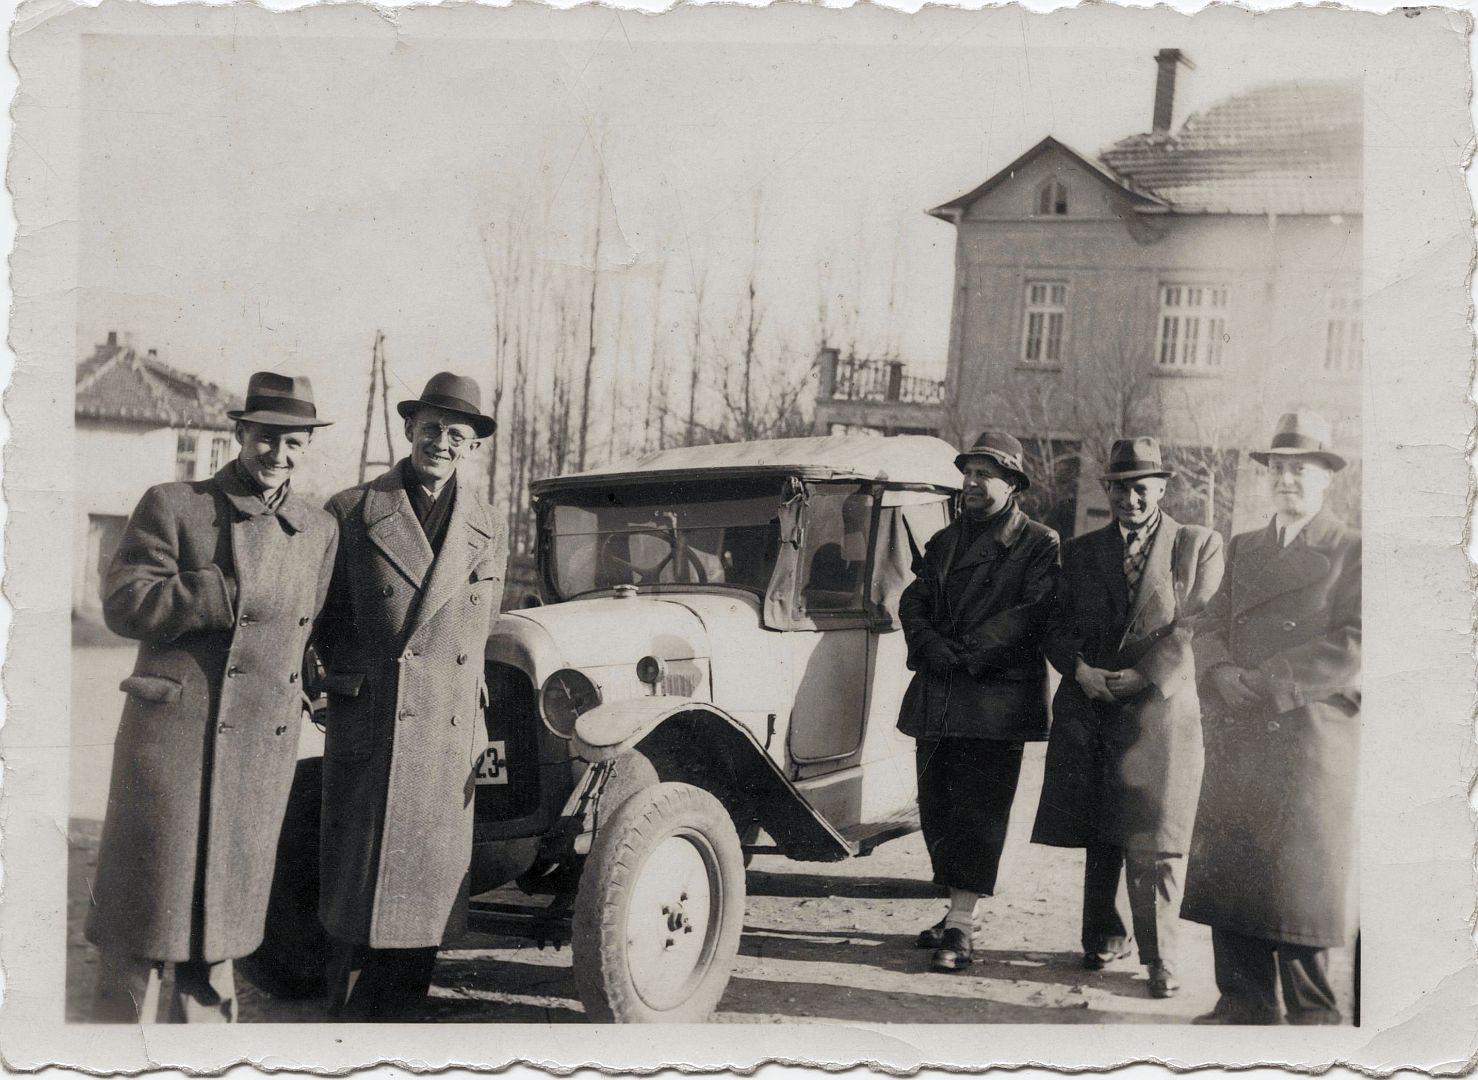 citroen_typ_a_kloster_drakenburg_12-1941_galerie